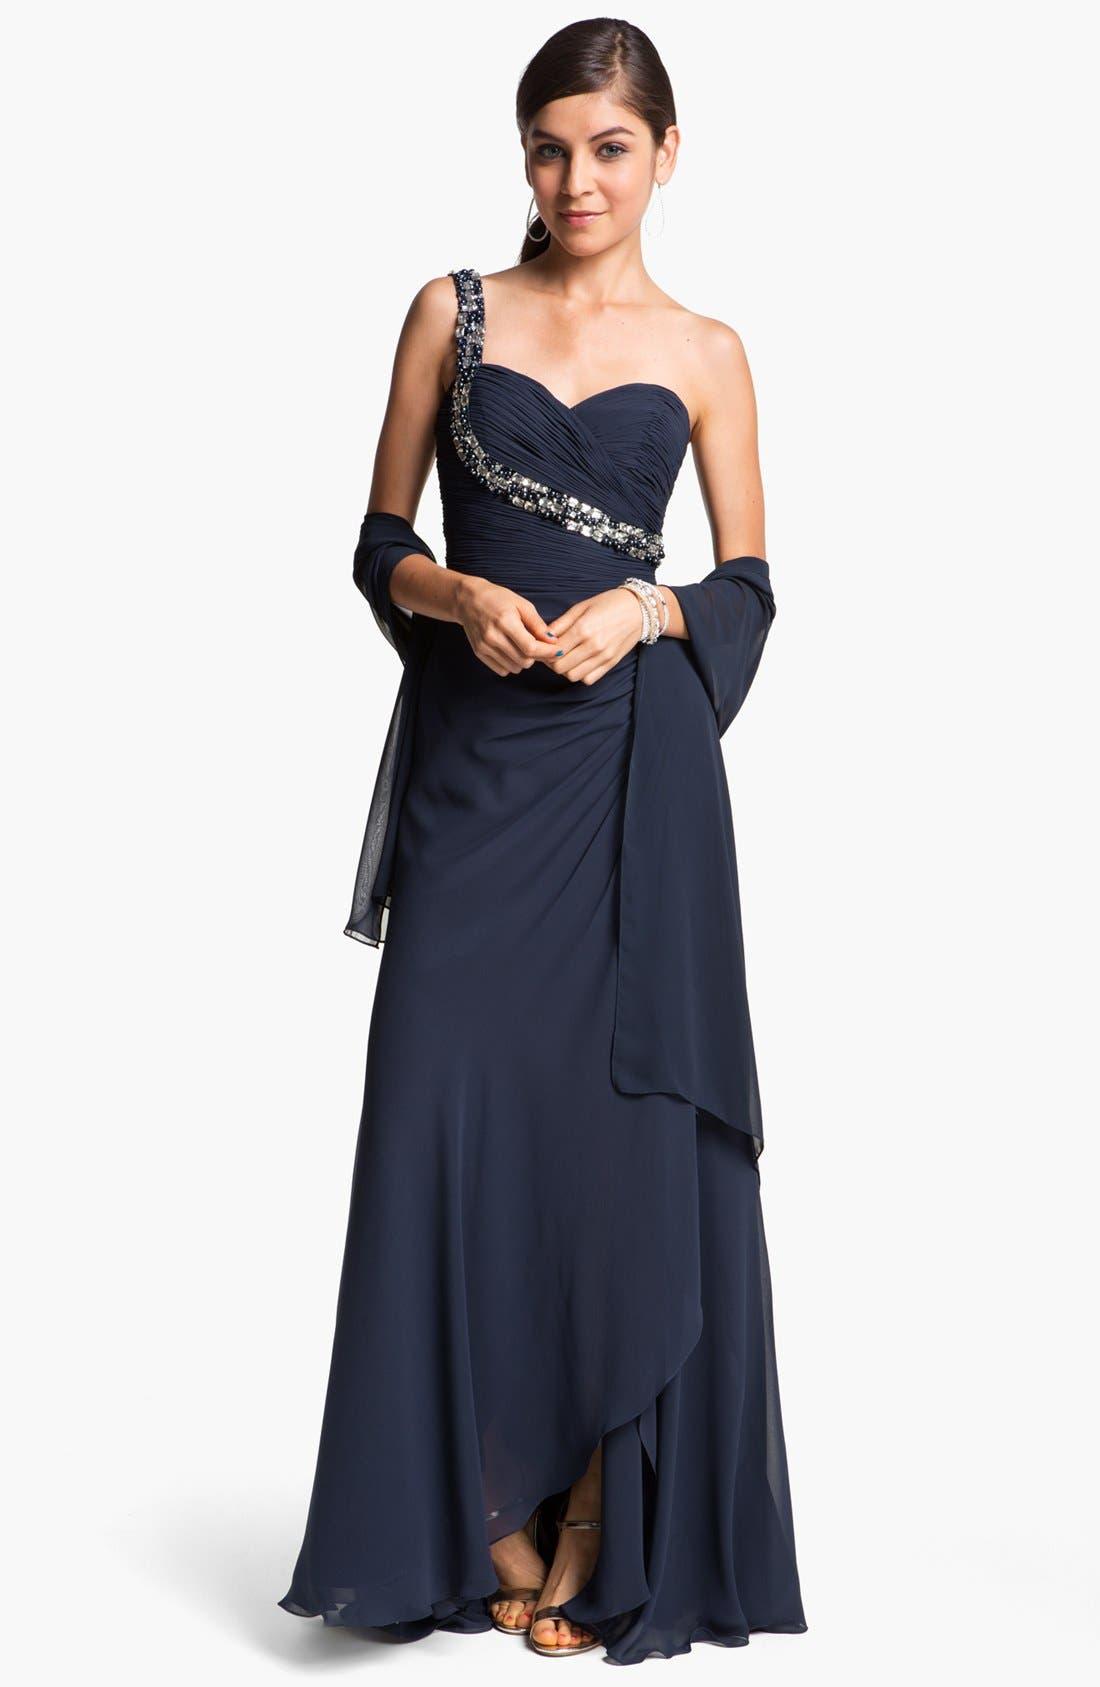 Alternate Image 1 Selected - Faviana Embellished One Shoulder Chiffon Gown & Shawl